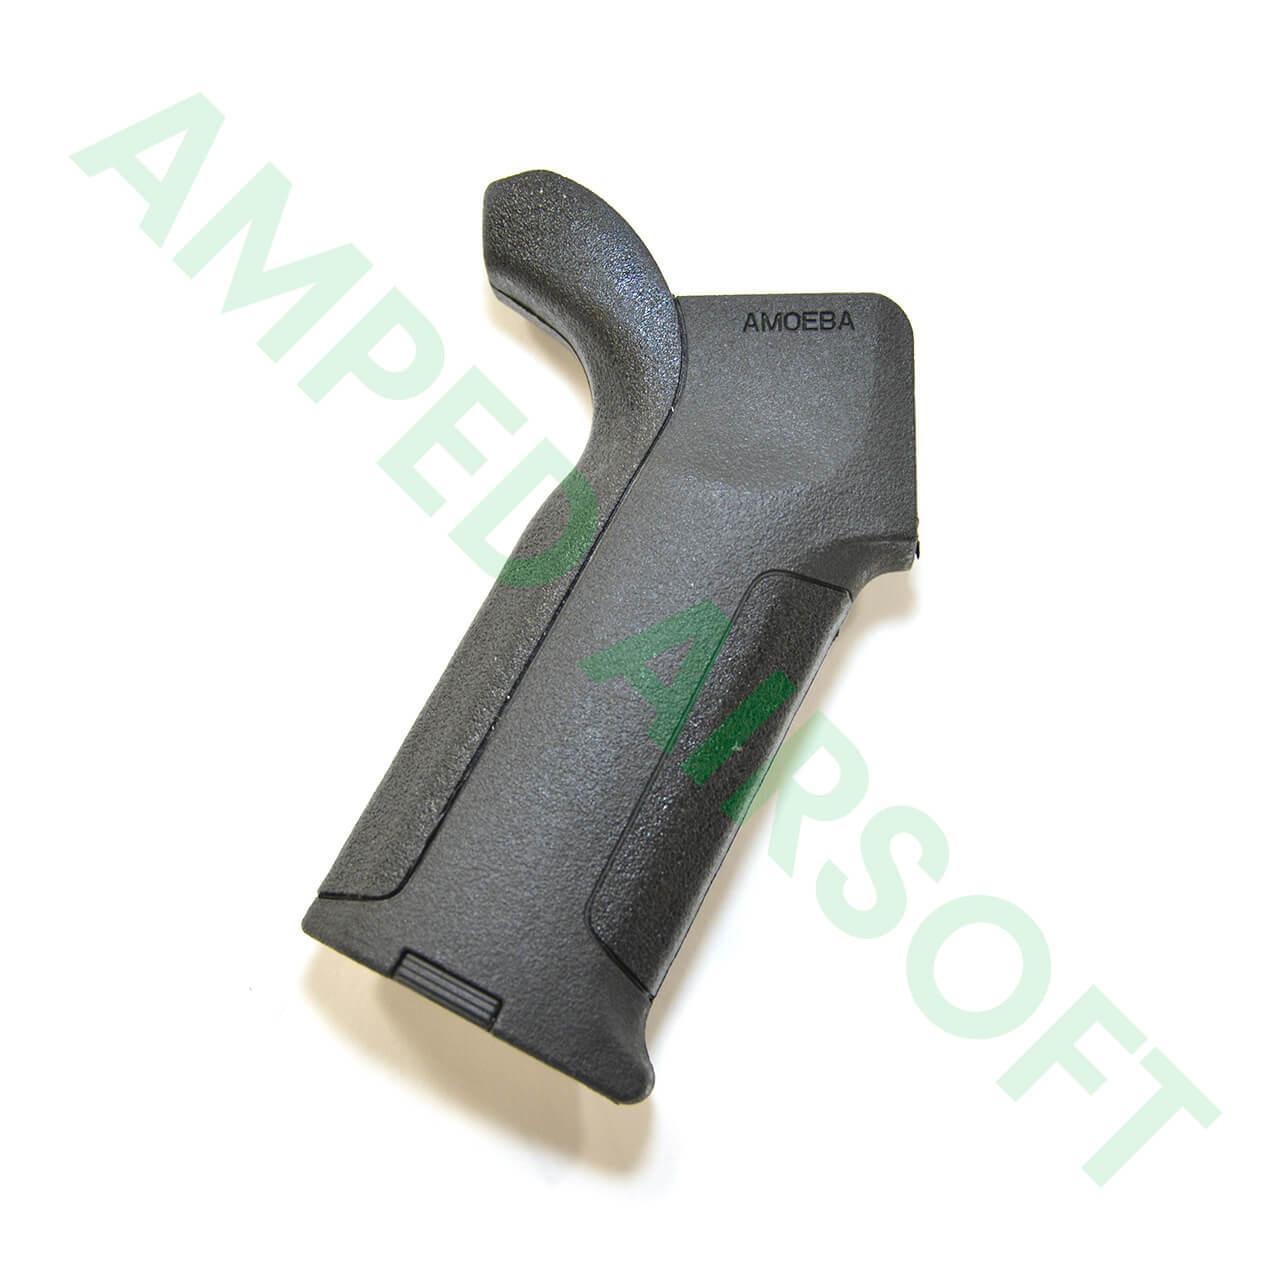 Amoeba - Pro Beavertail Backstrap M4 Grip (Black) Right Side